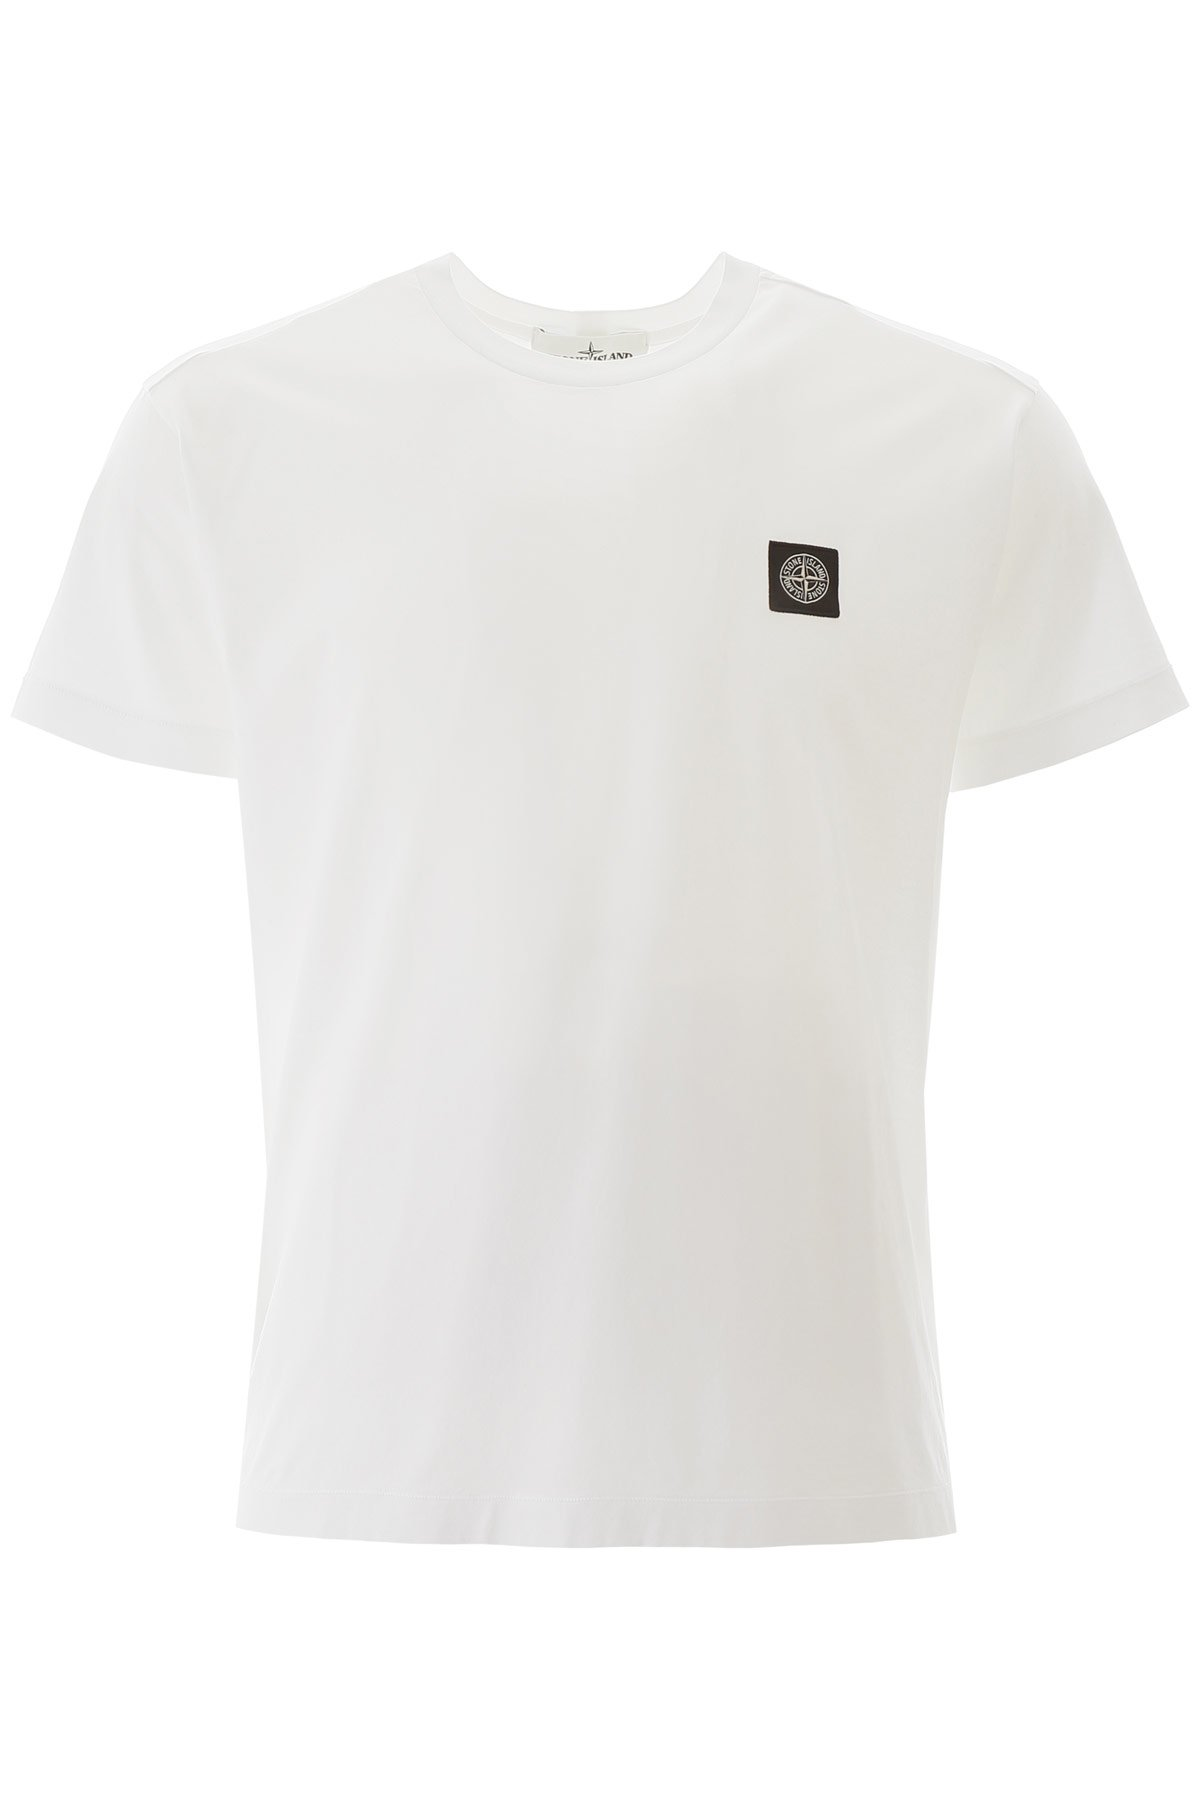 Stone island t-shirt logo